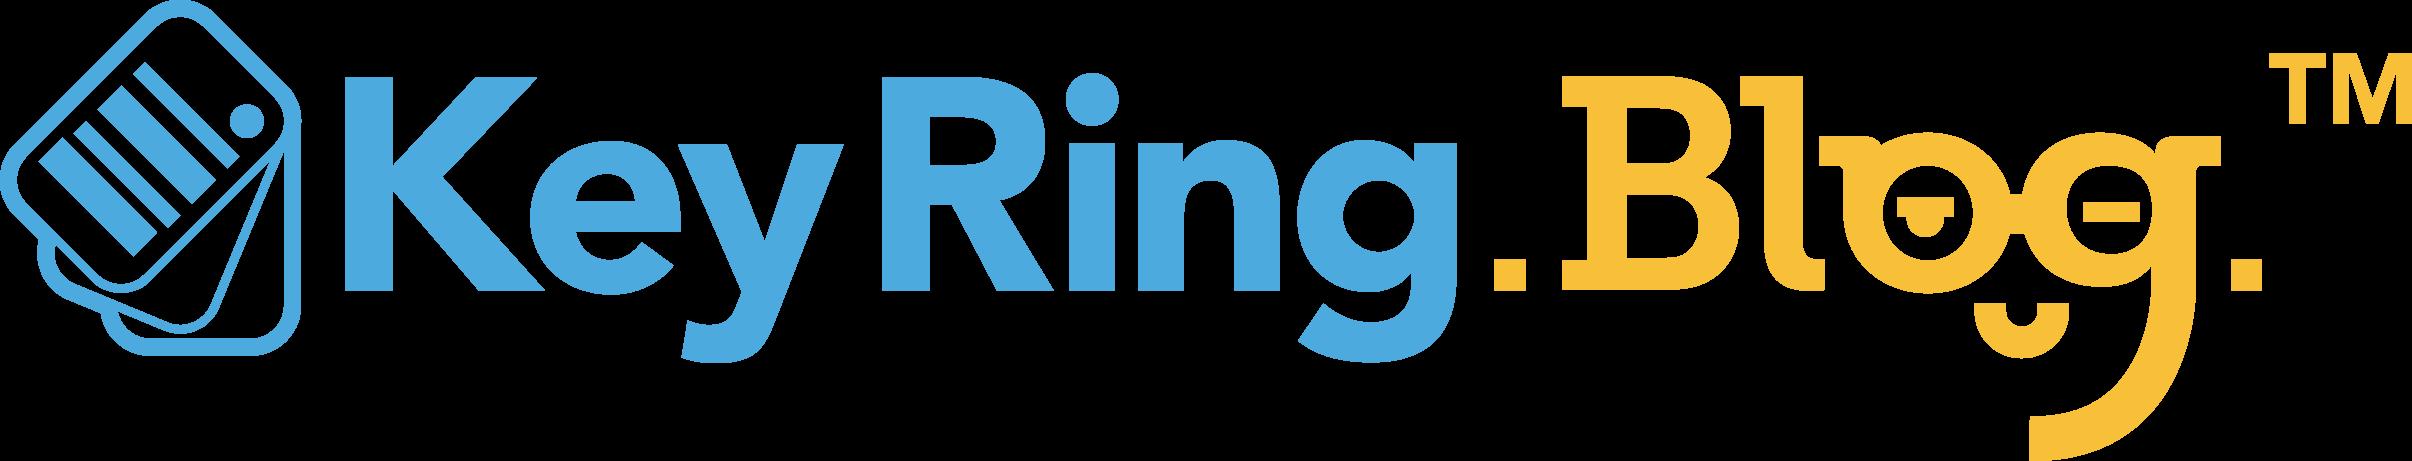 Key Ring